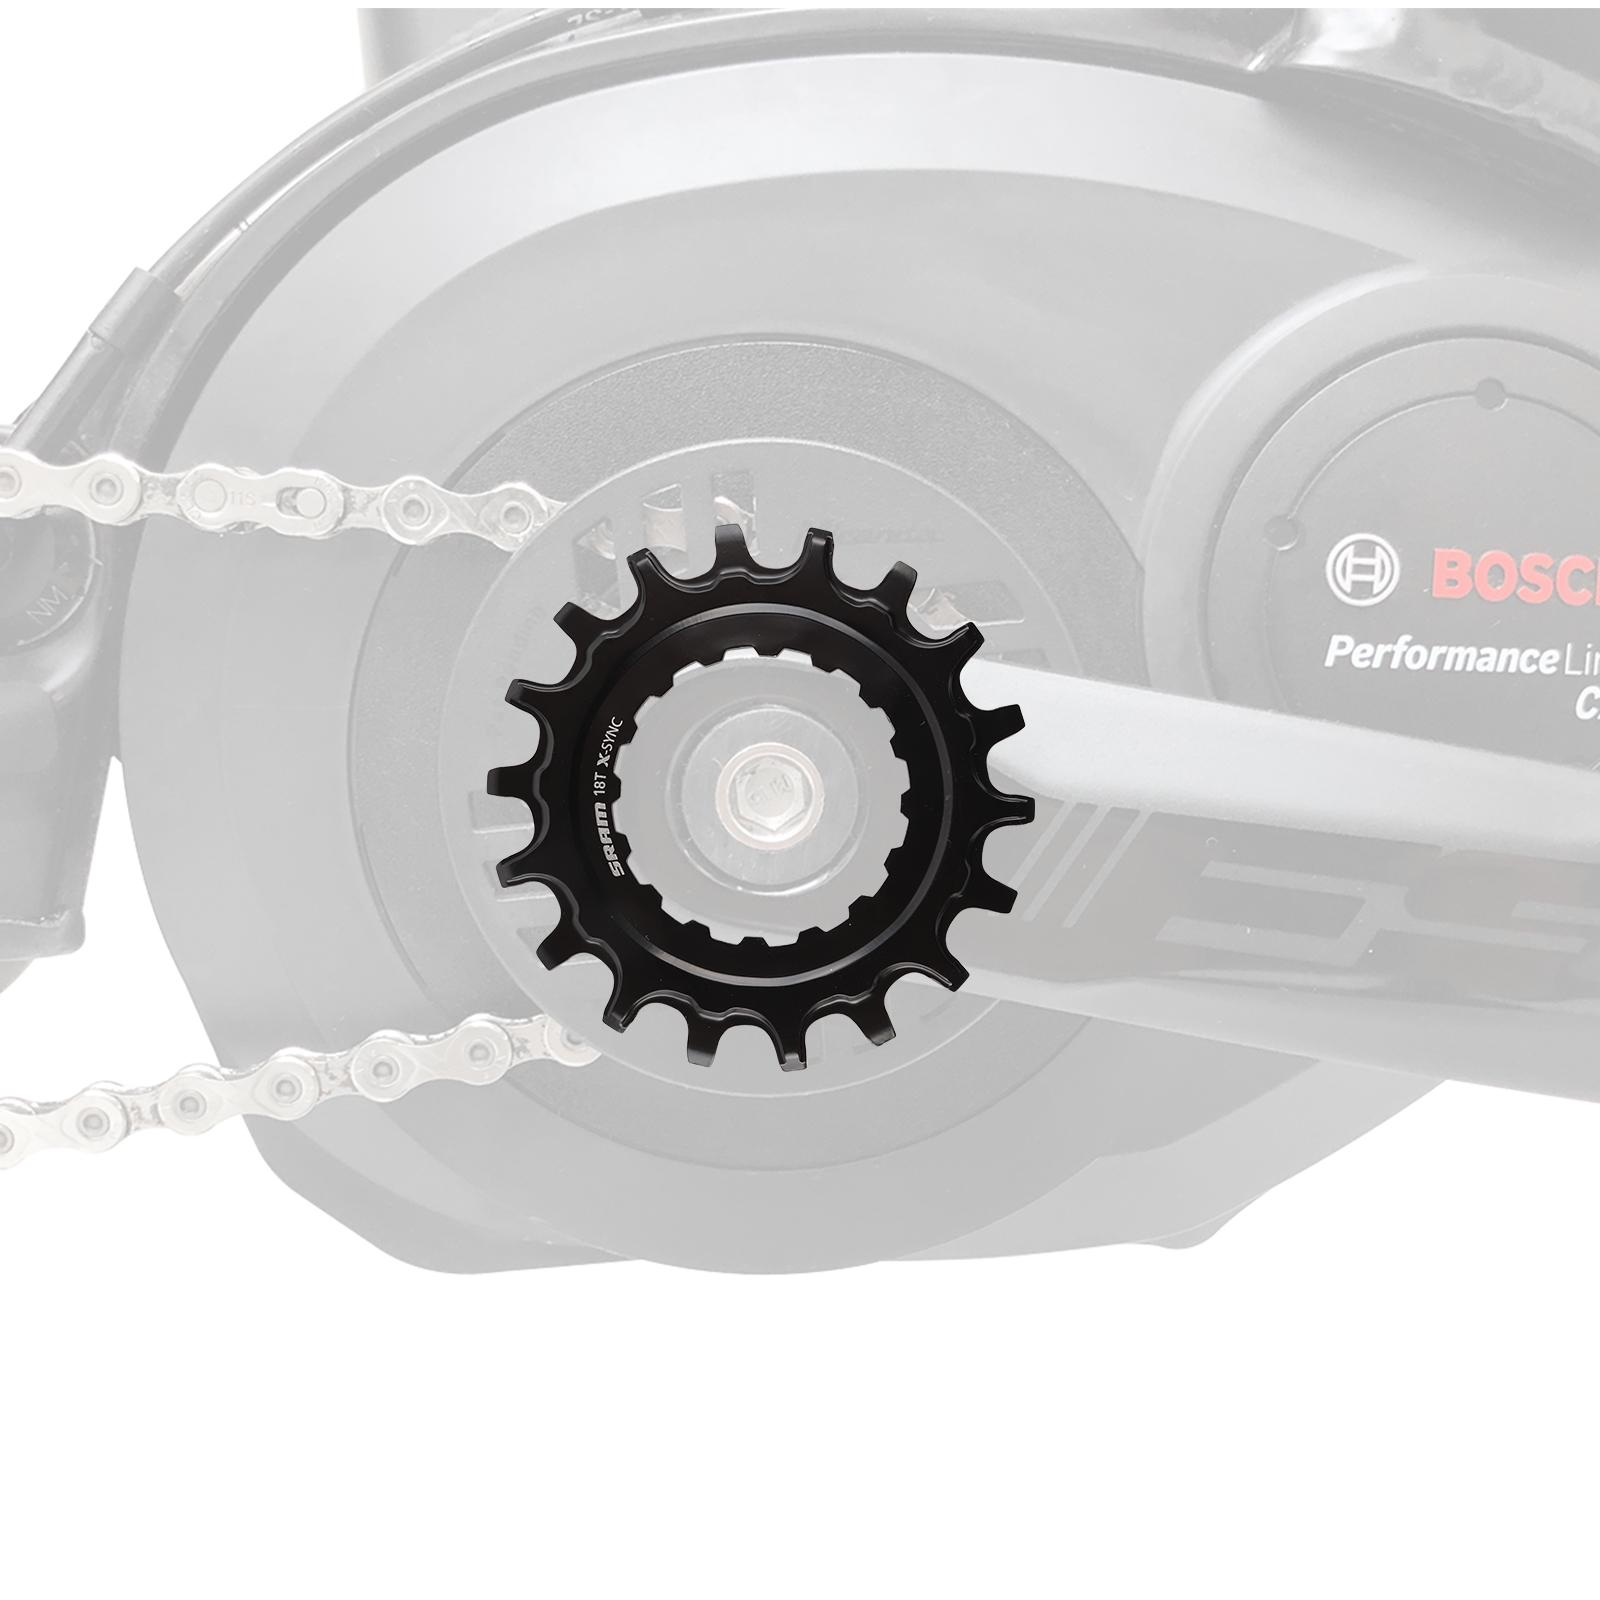 SRAM Kettenblatt 18T EX1 X-Sync™ für Bosch Mittelmotor eBike